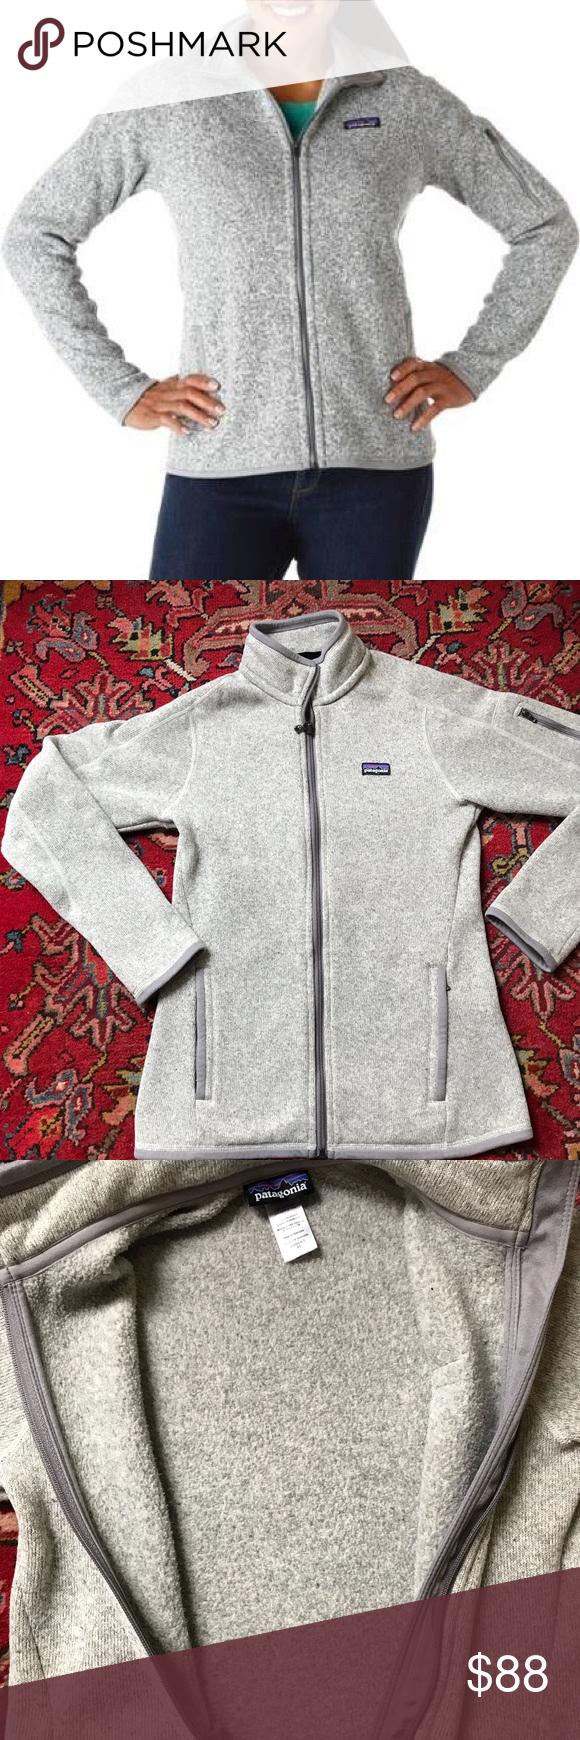 Patagonia Womens Better Sweater Fleece Jacket In 2018 My Posh